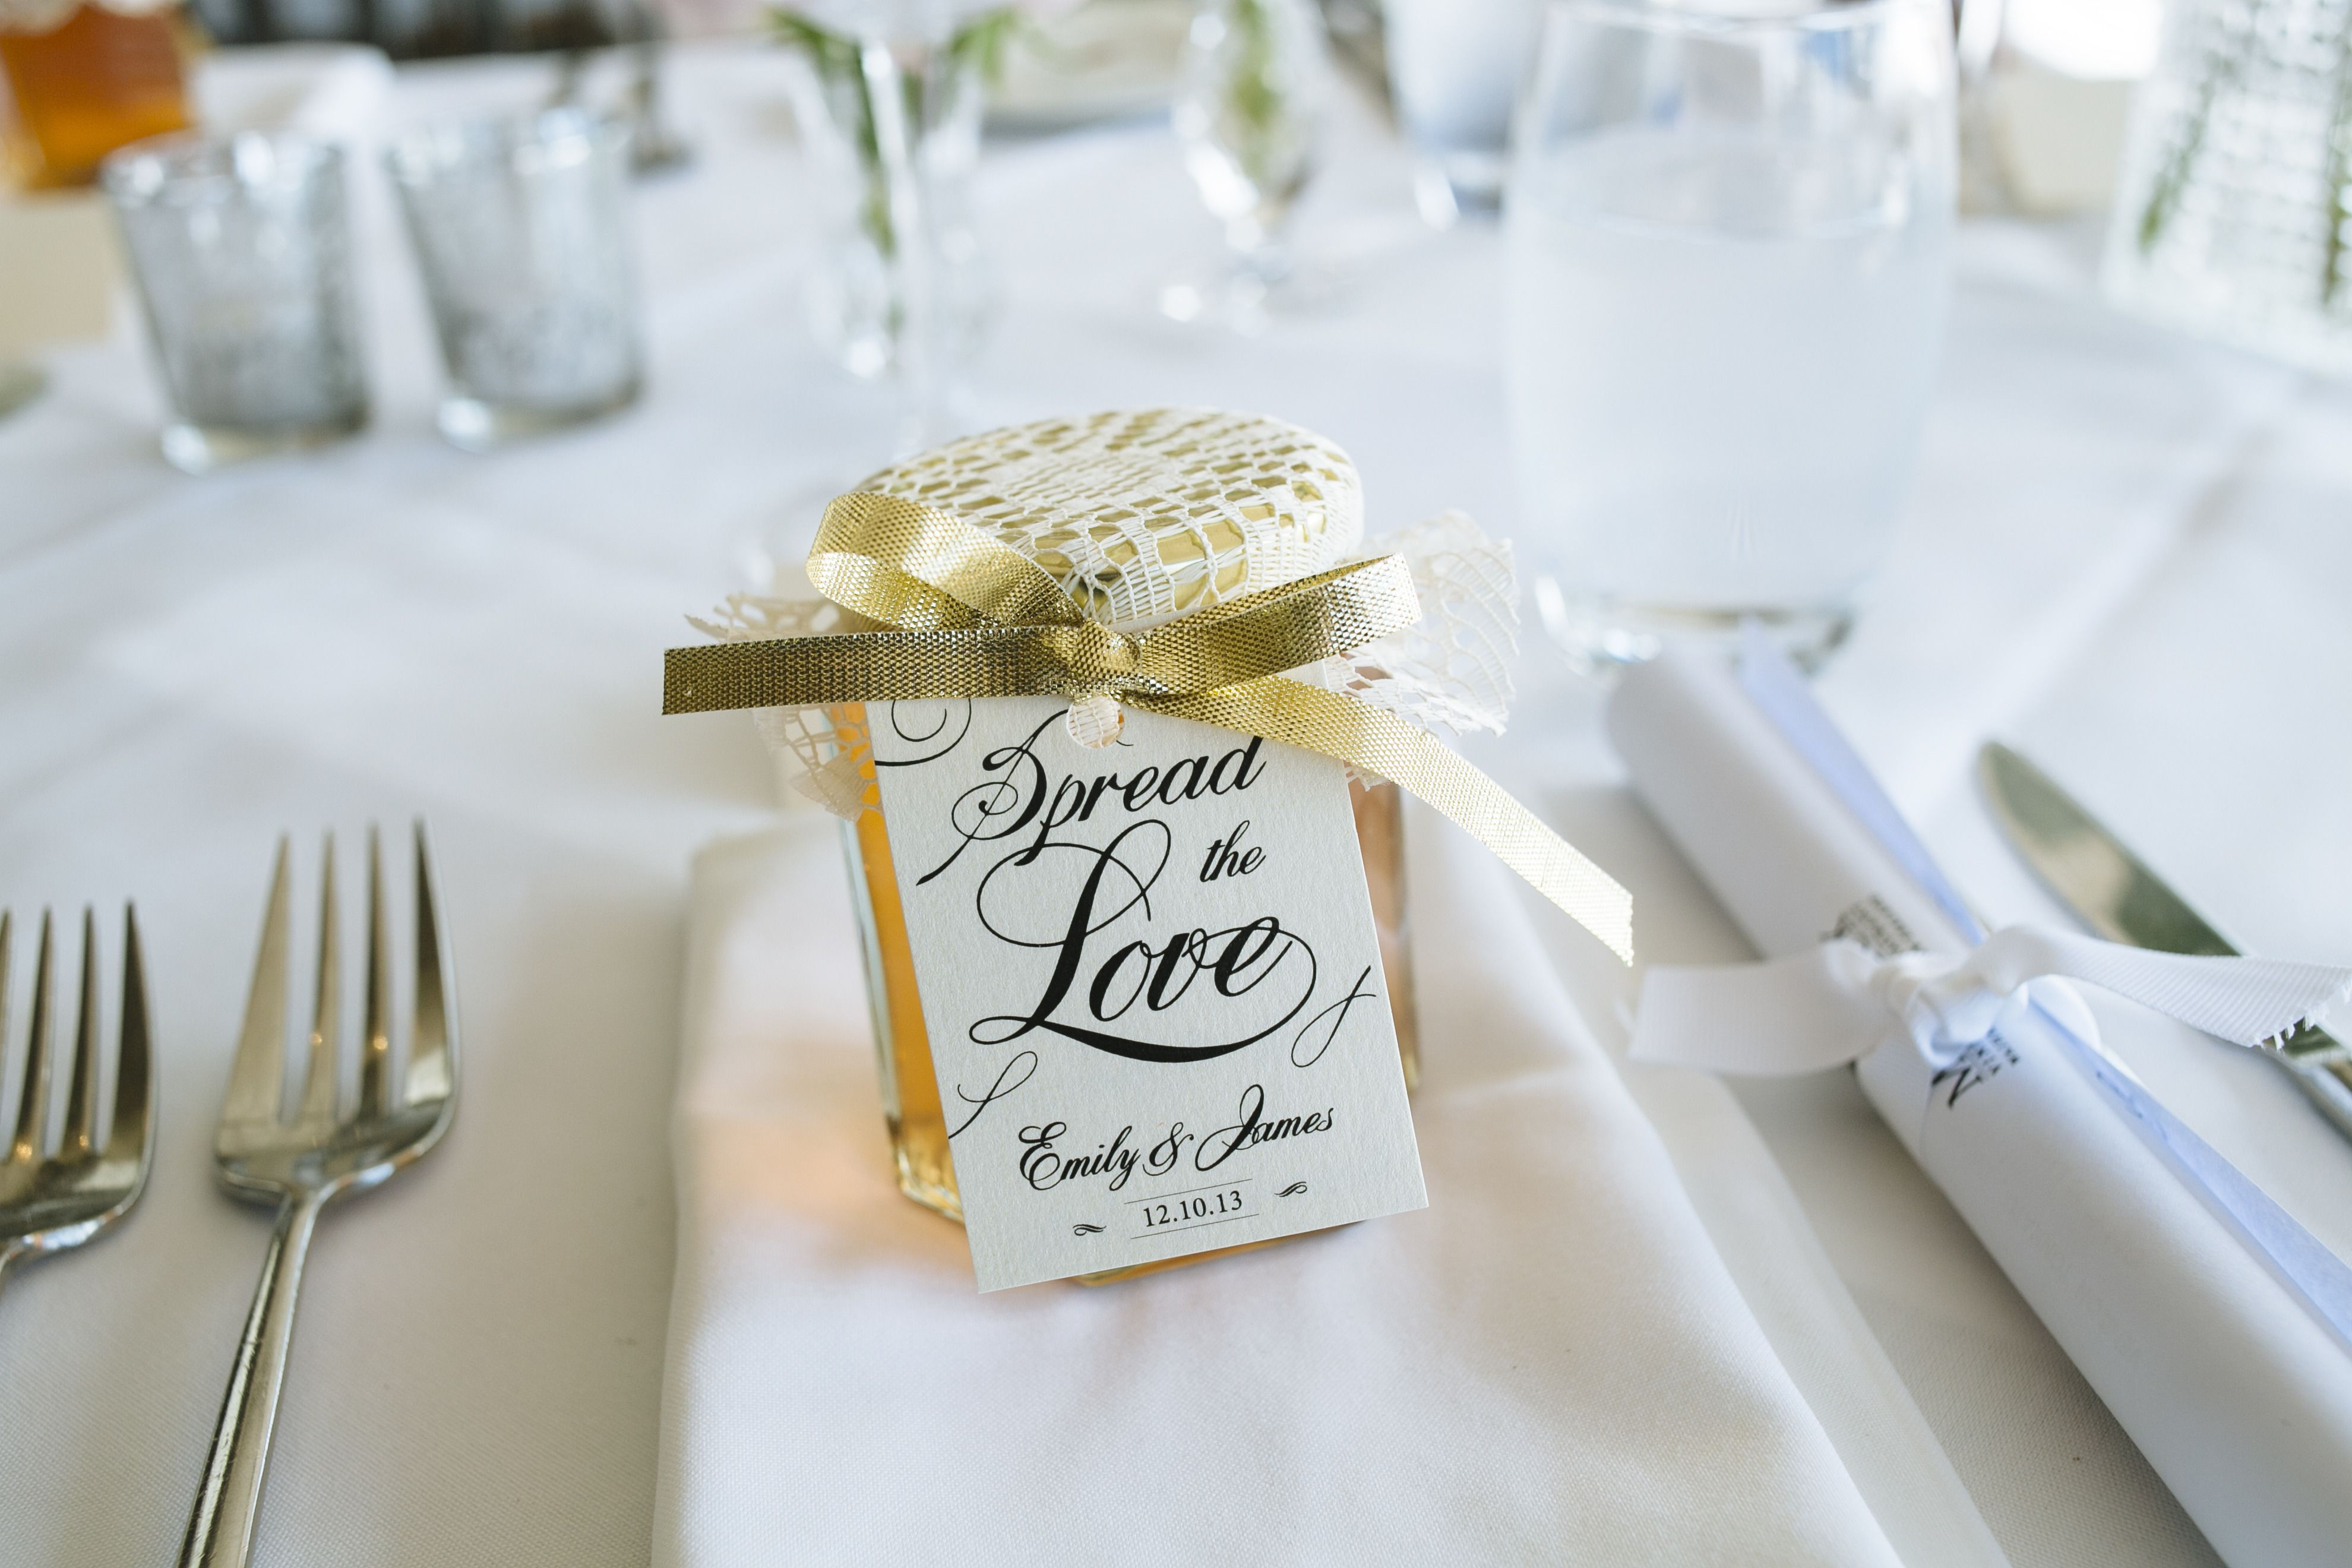 Waiheke Island Wedding at Mudbrick Vineyard | Wedding, Favors and ...